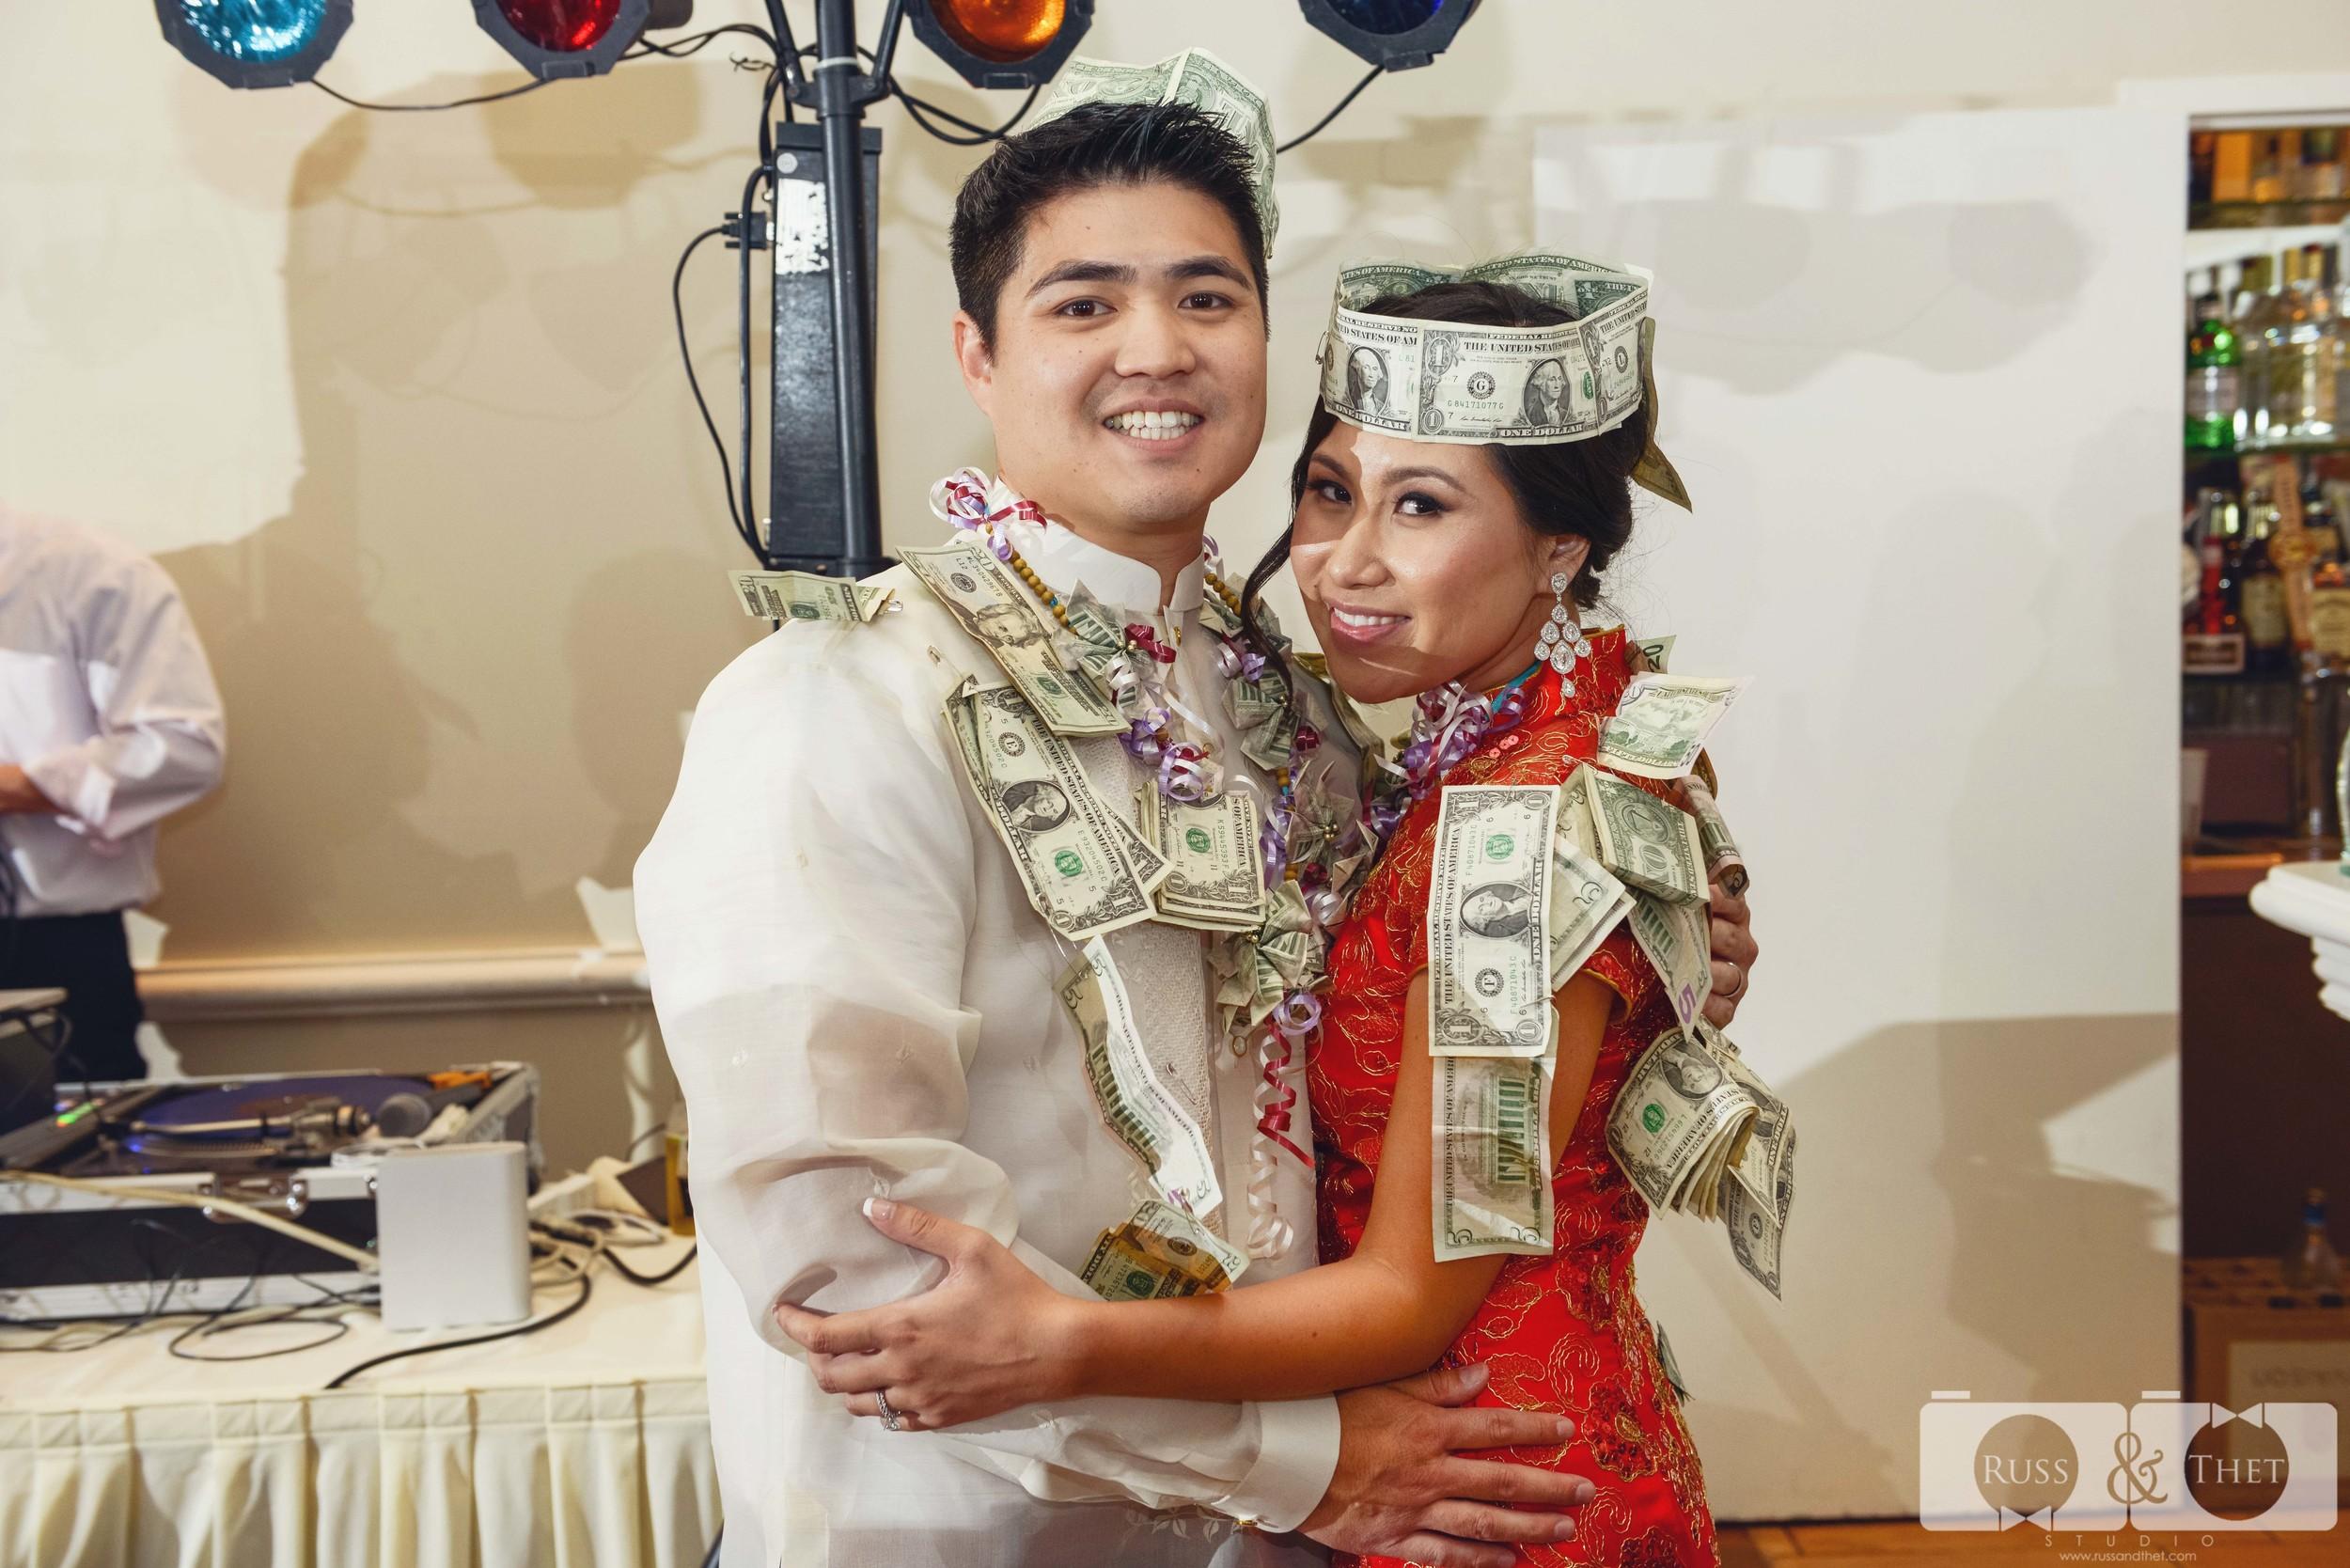 summit-house-fullerton-wedding-photographer-137.JPG